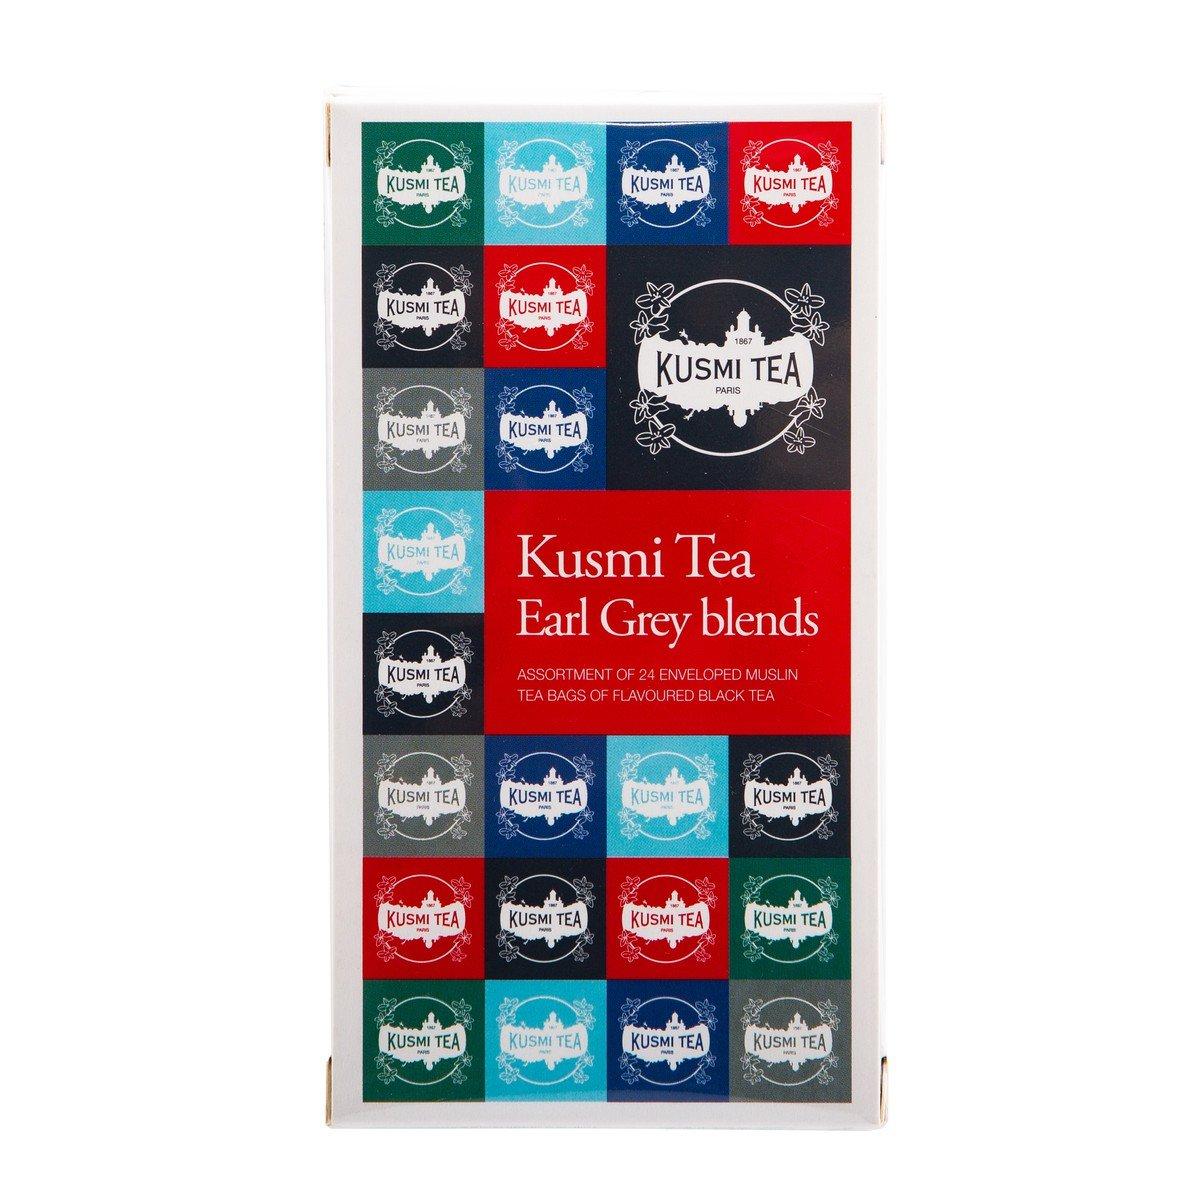 Kusmi Tea Paris - Earl Grey Blends 24 un